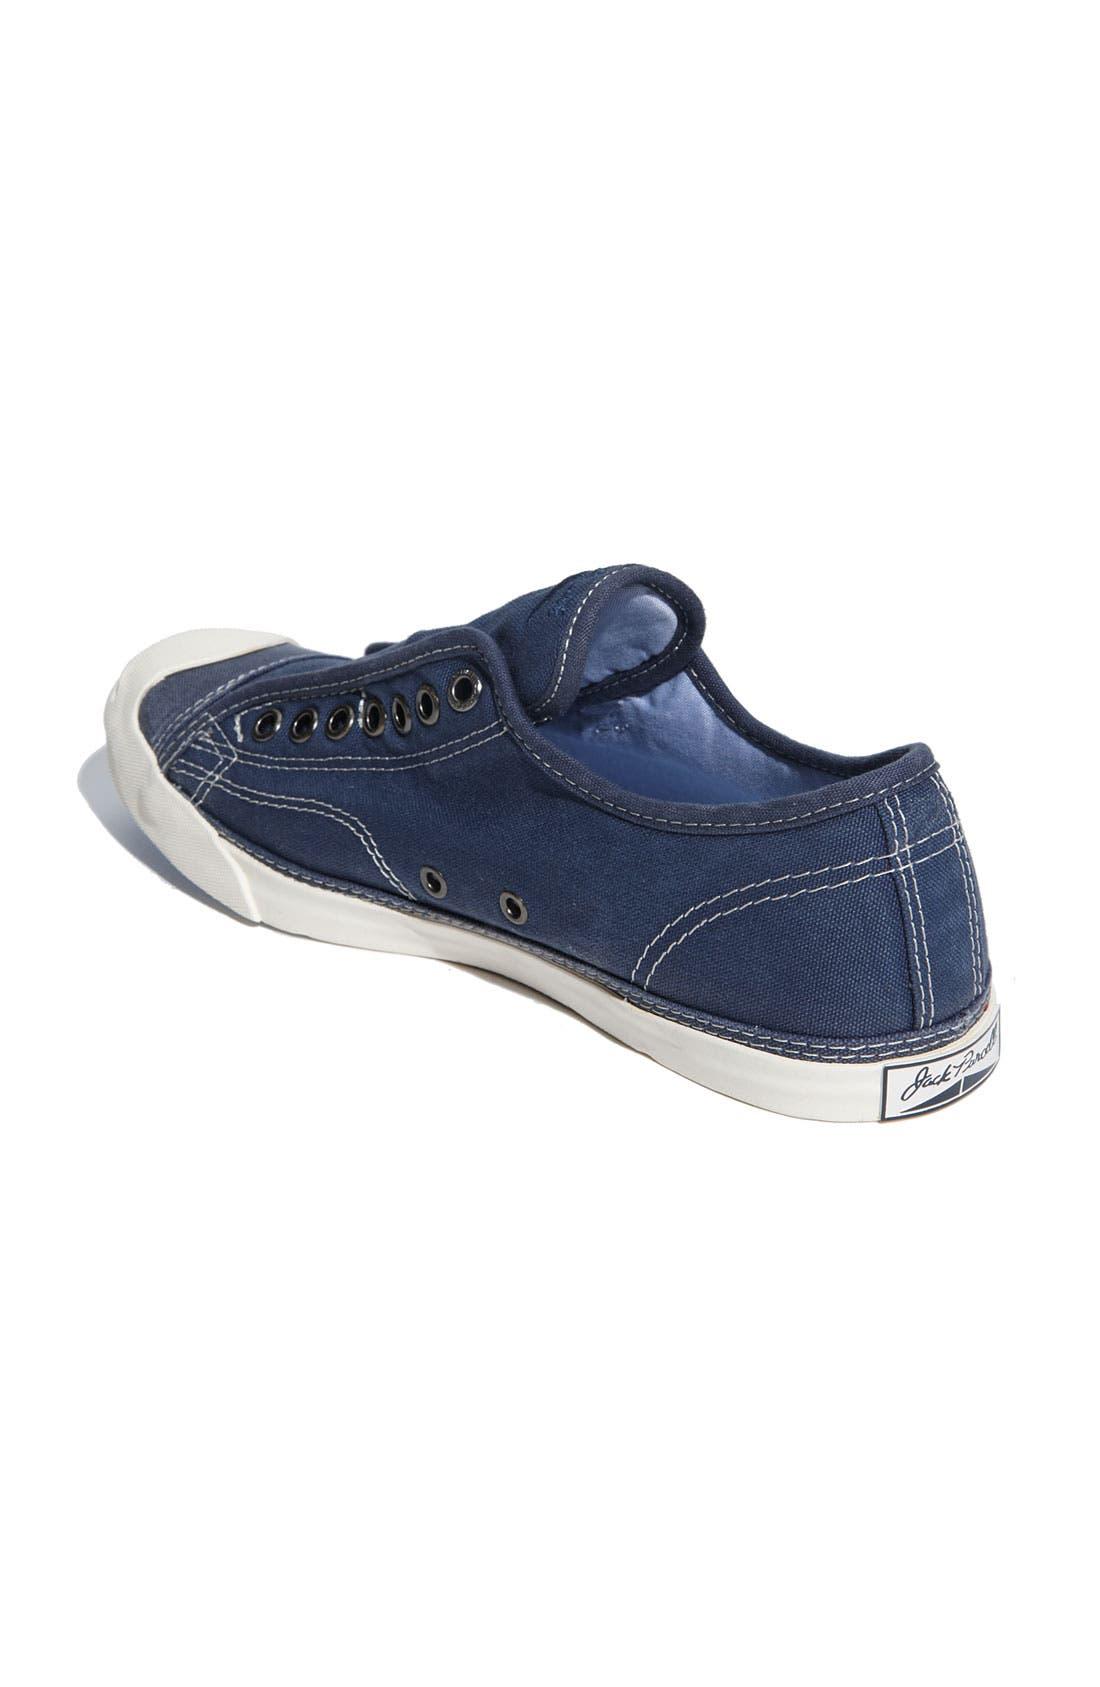 Alternate Image 2  - Converse 'Jack Purcell' Slip-On Sneaker (Women)